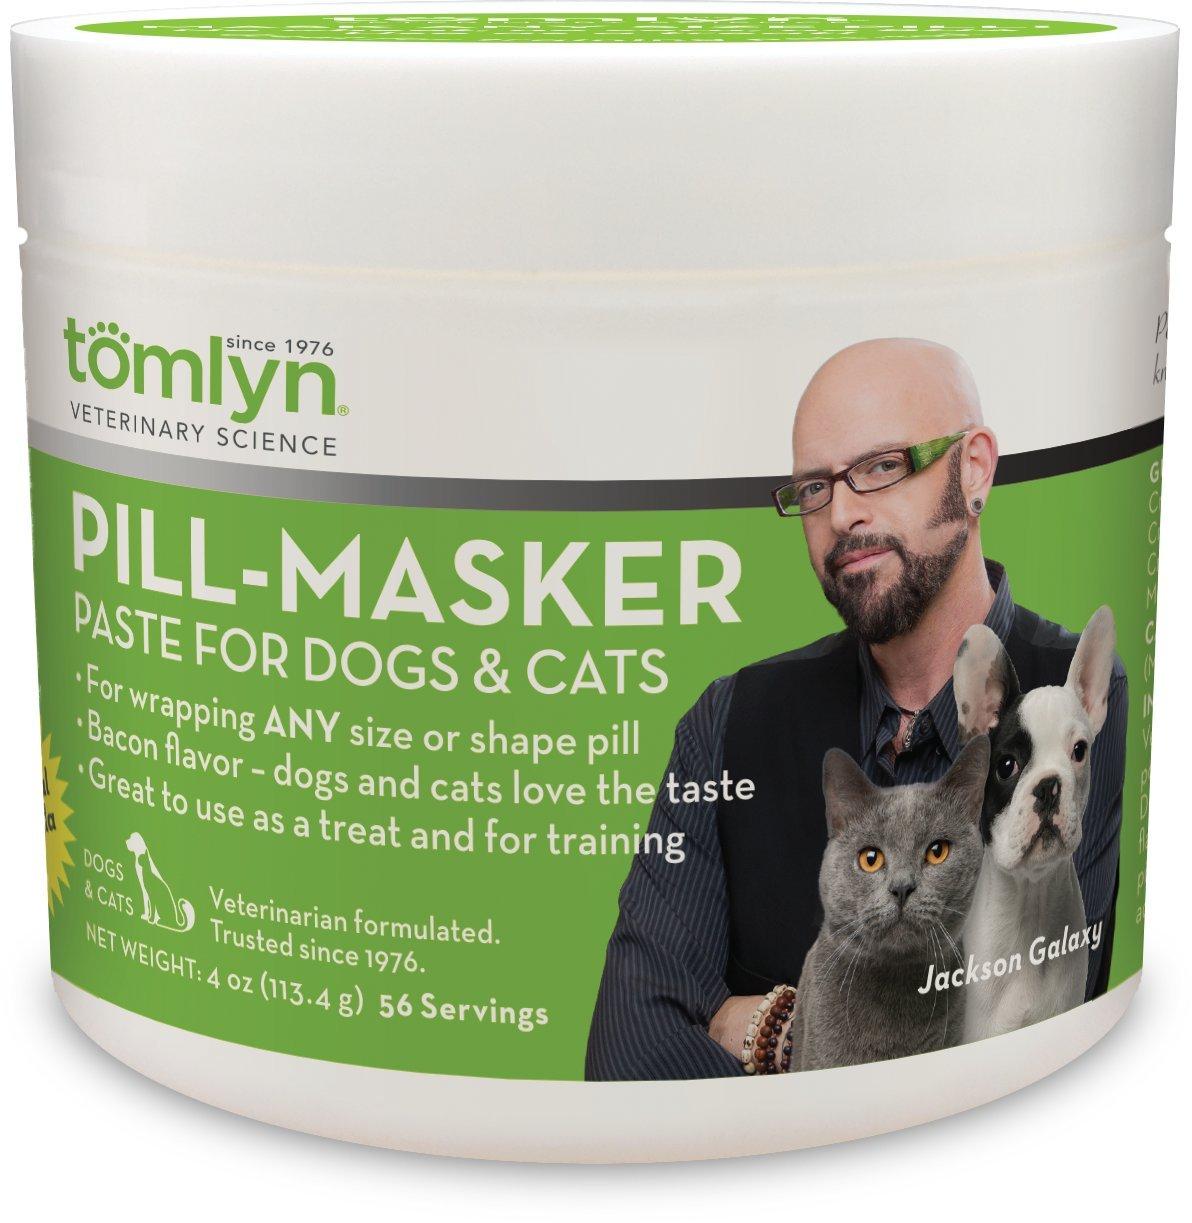 dog supplies online tomlyn pill-masker original dogs & cats bacon flavor - 4oz